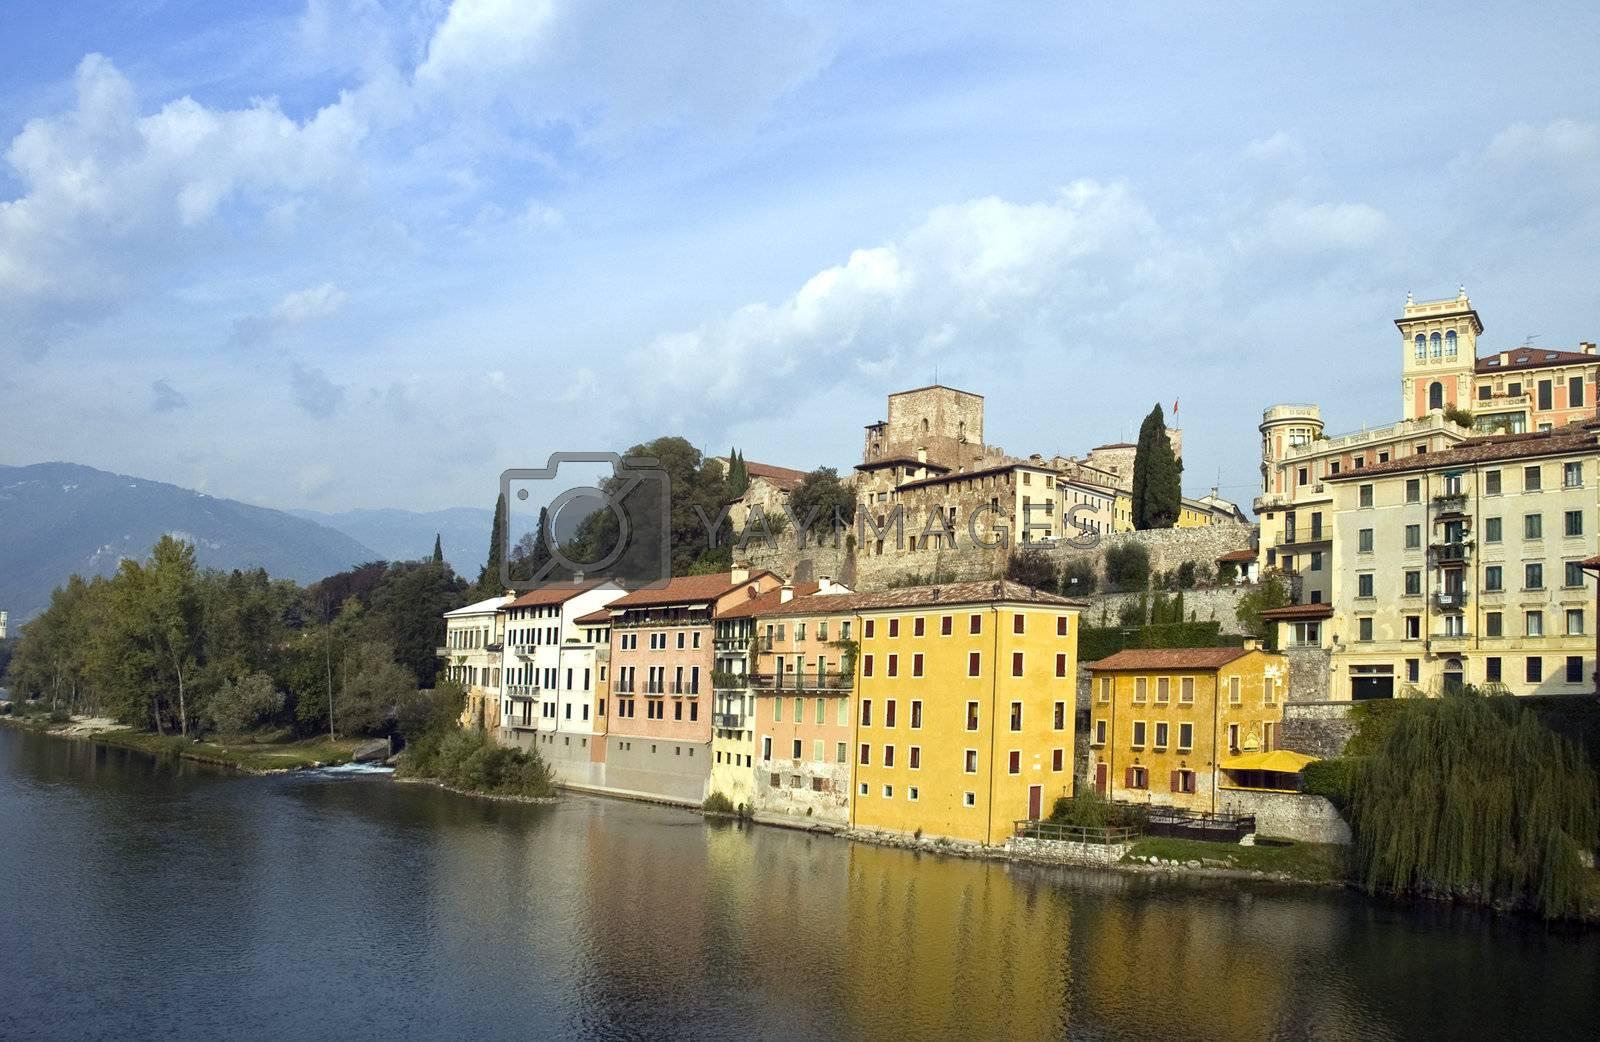 Houses on the river Brenta